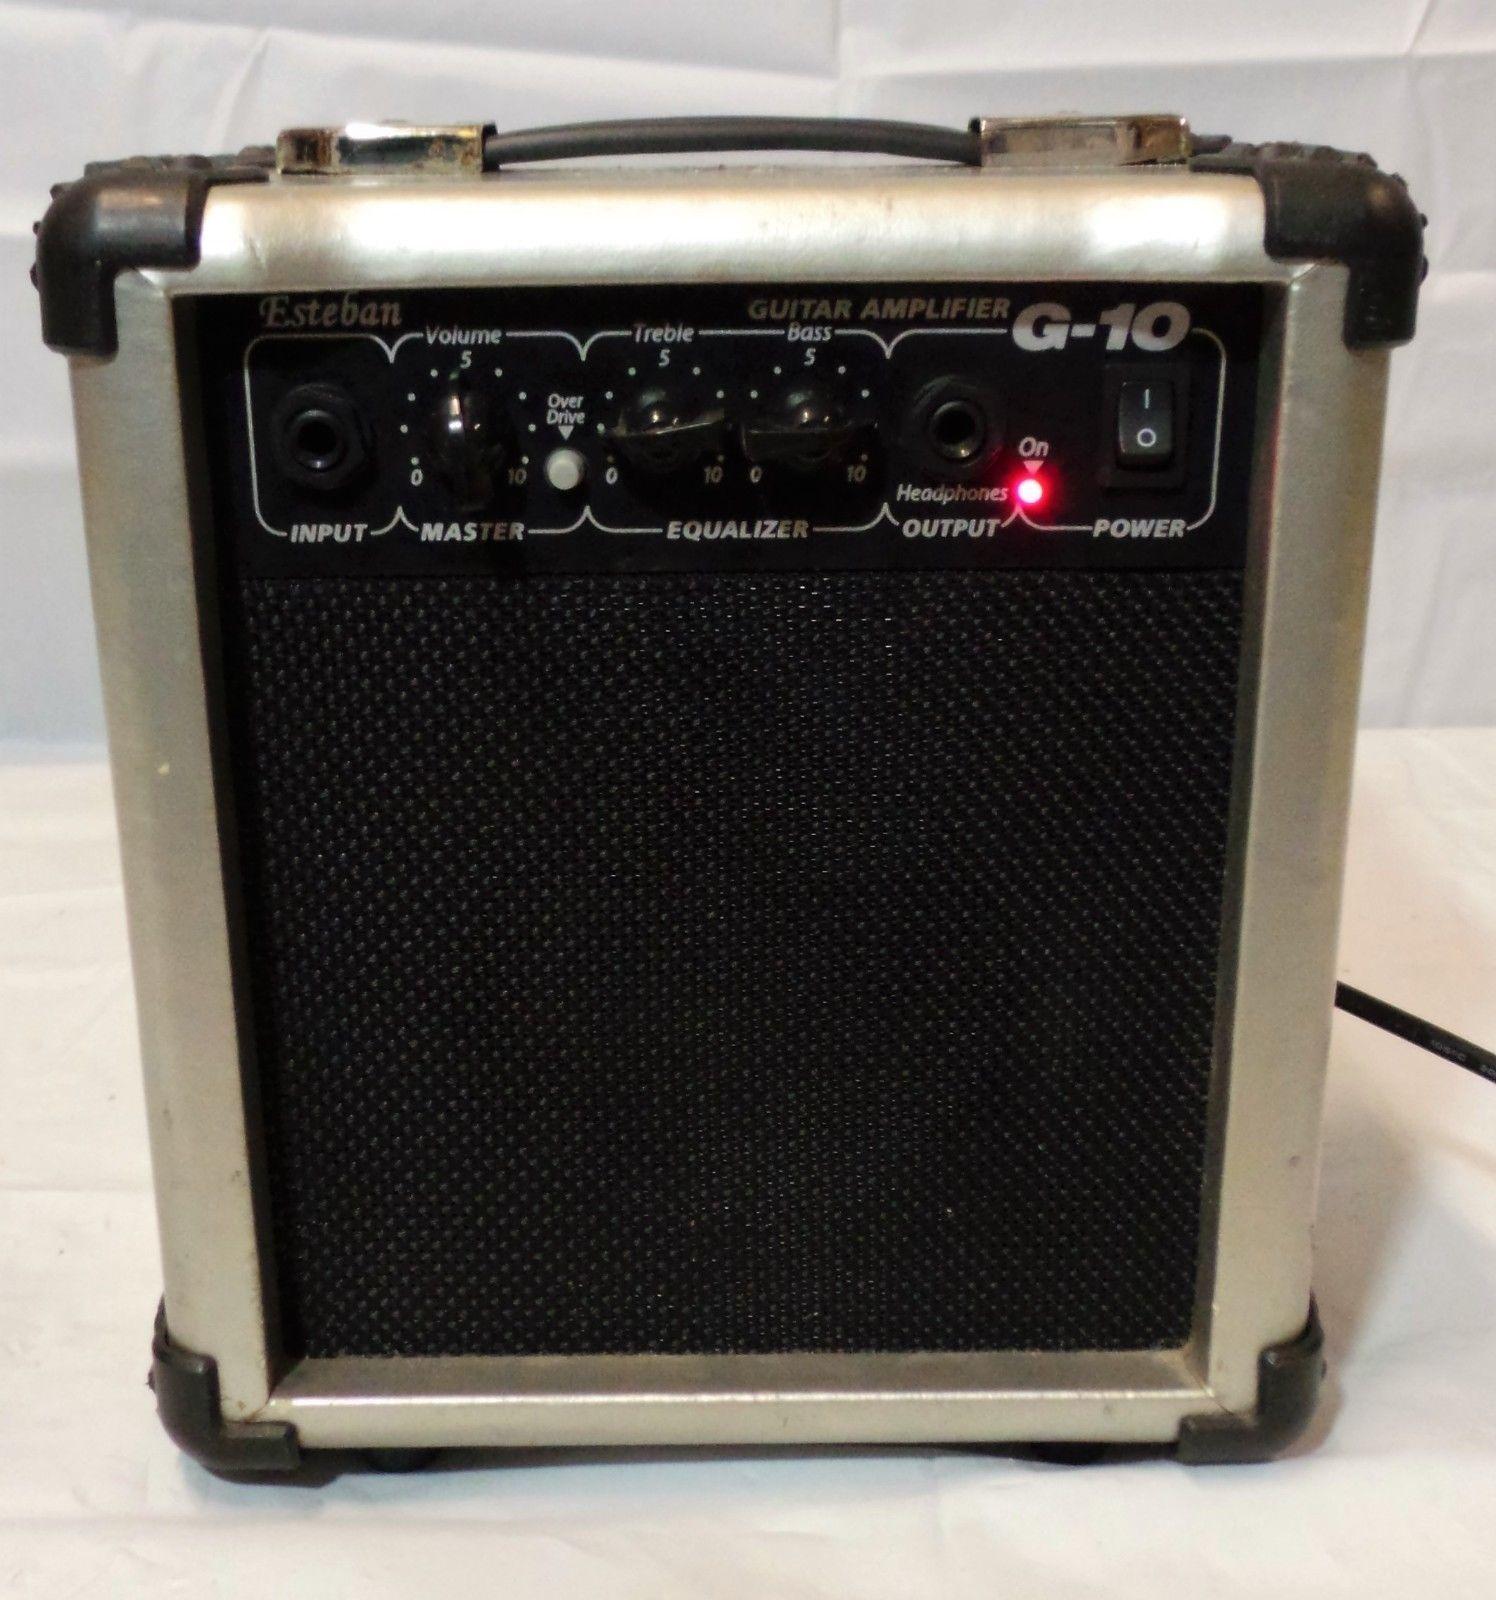 medium resolution of esteban g10 12 watt guitar amp amplifier electric acoustic music portable mobile please retweet